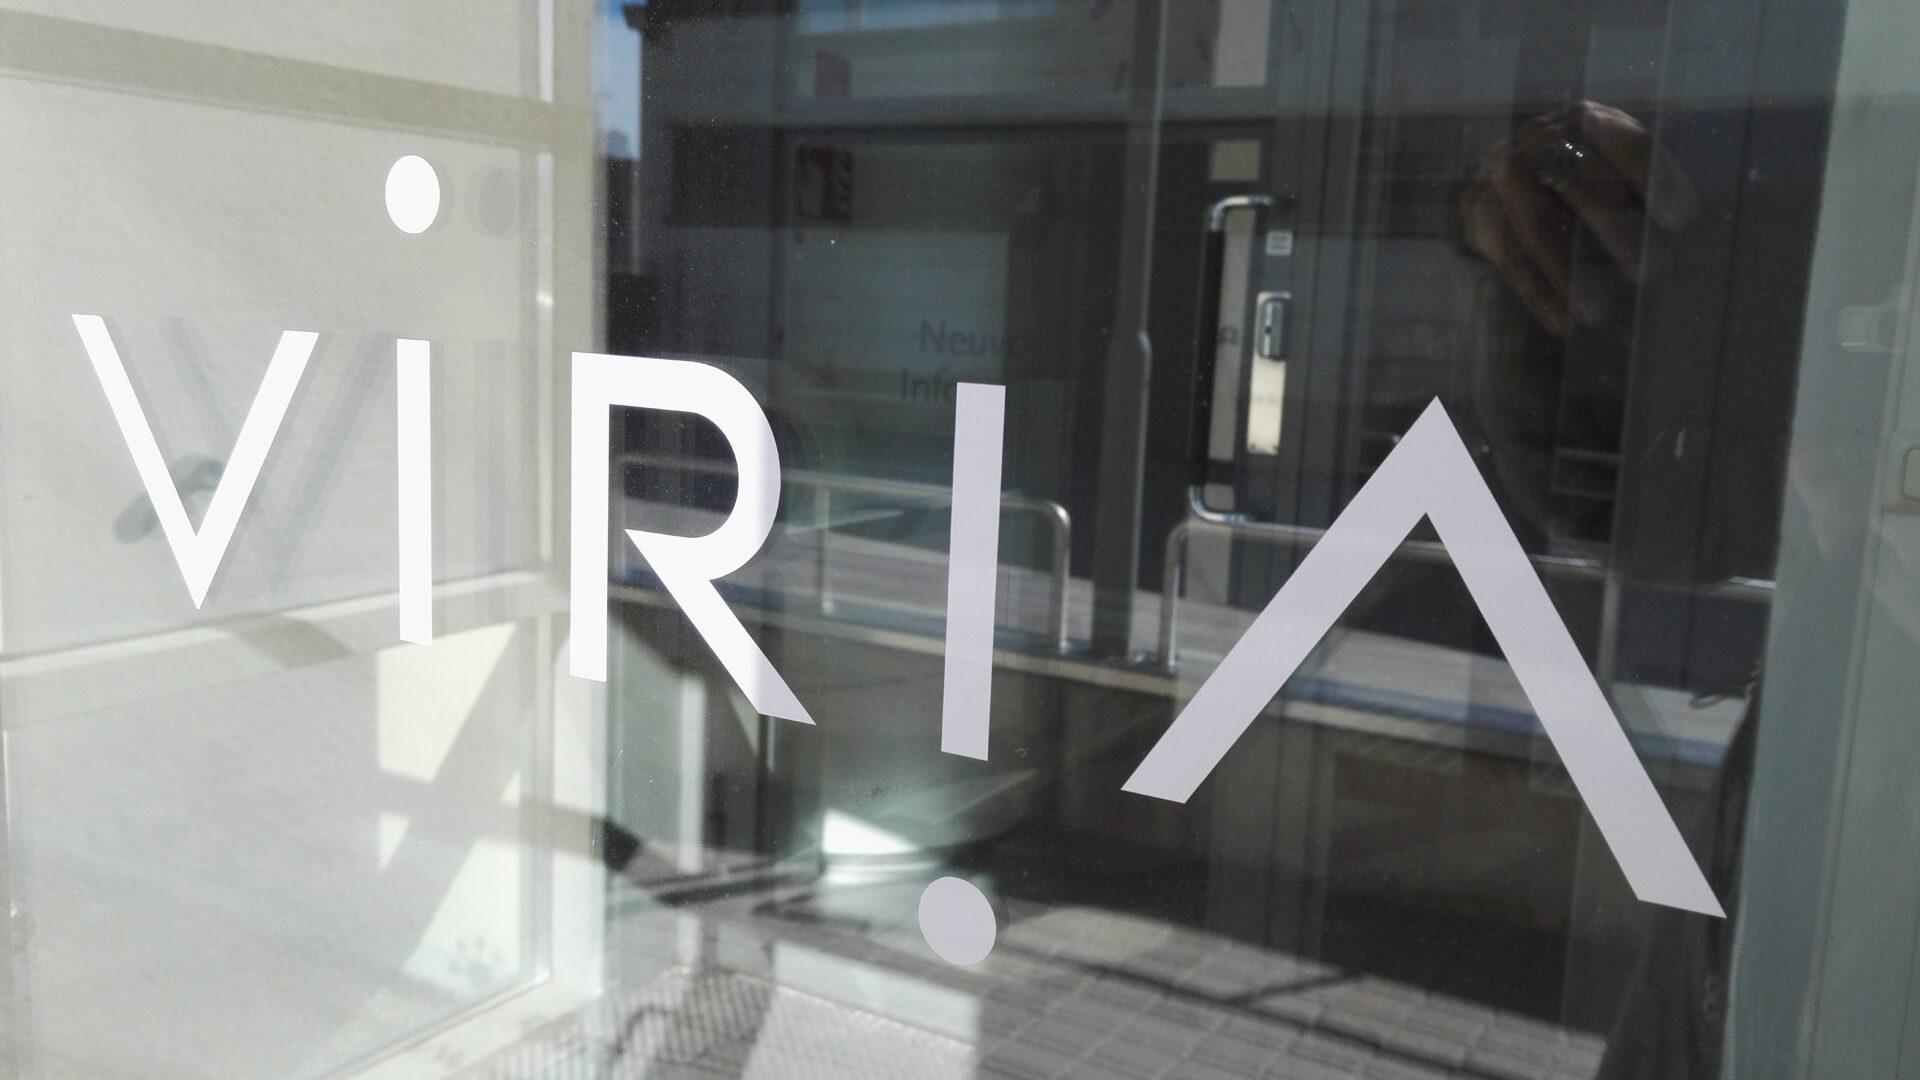 Virian logo